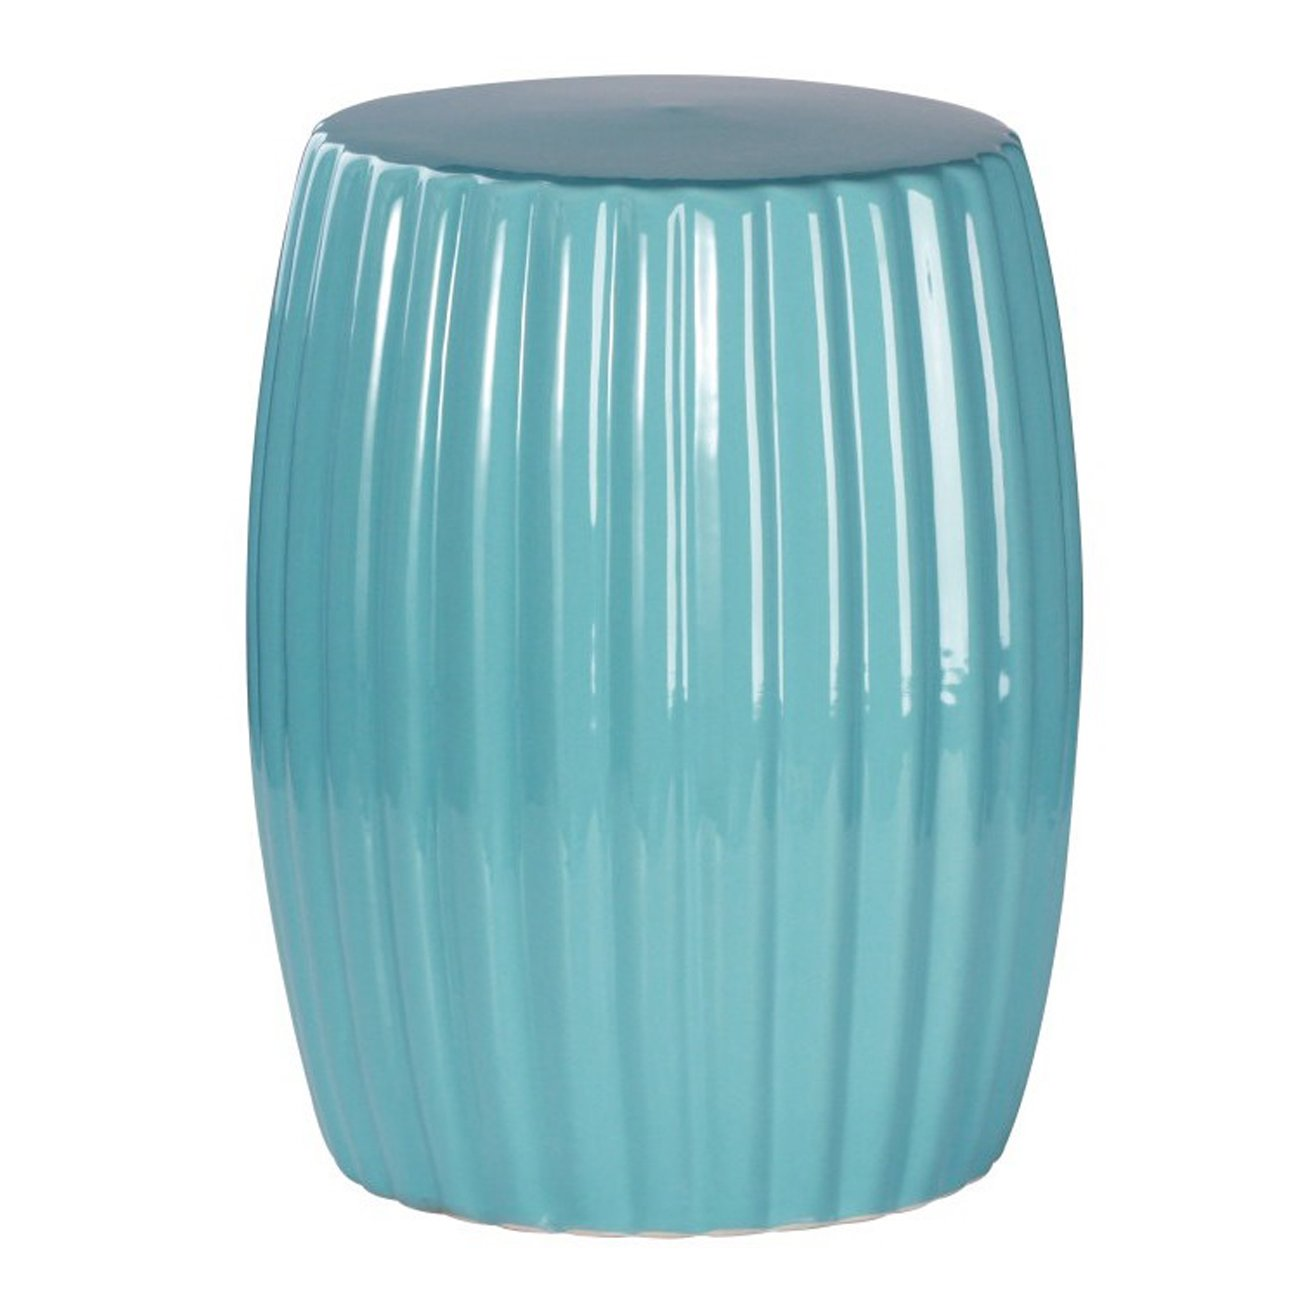 Abbyson® Megan Ceramic Garden Stool, Robbins Egg